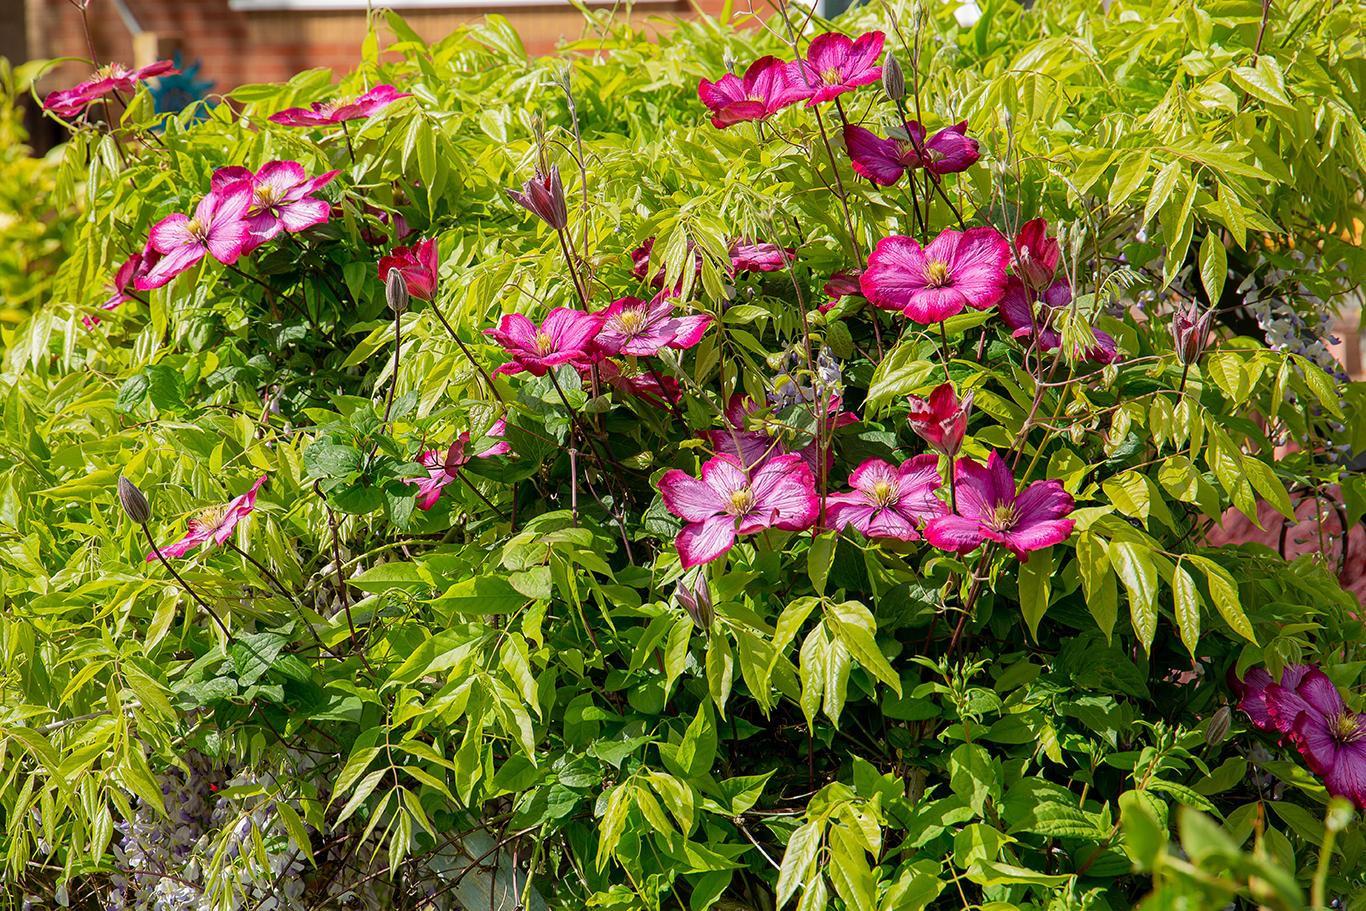 clematis flowers in bloom (1 of 1)